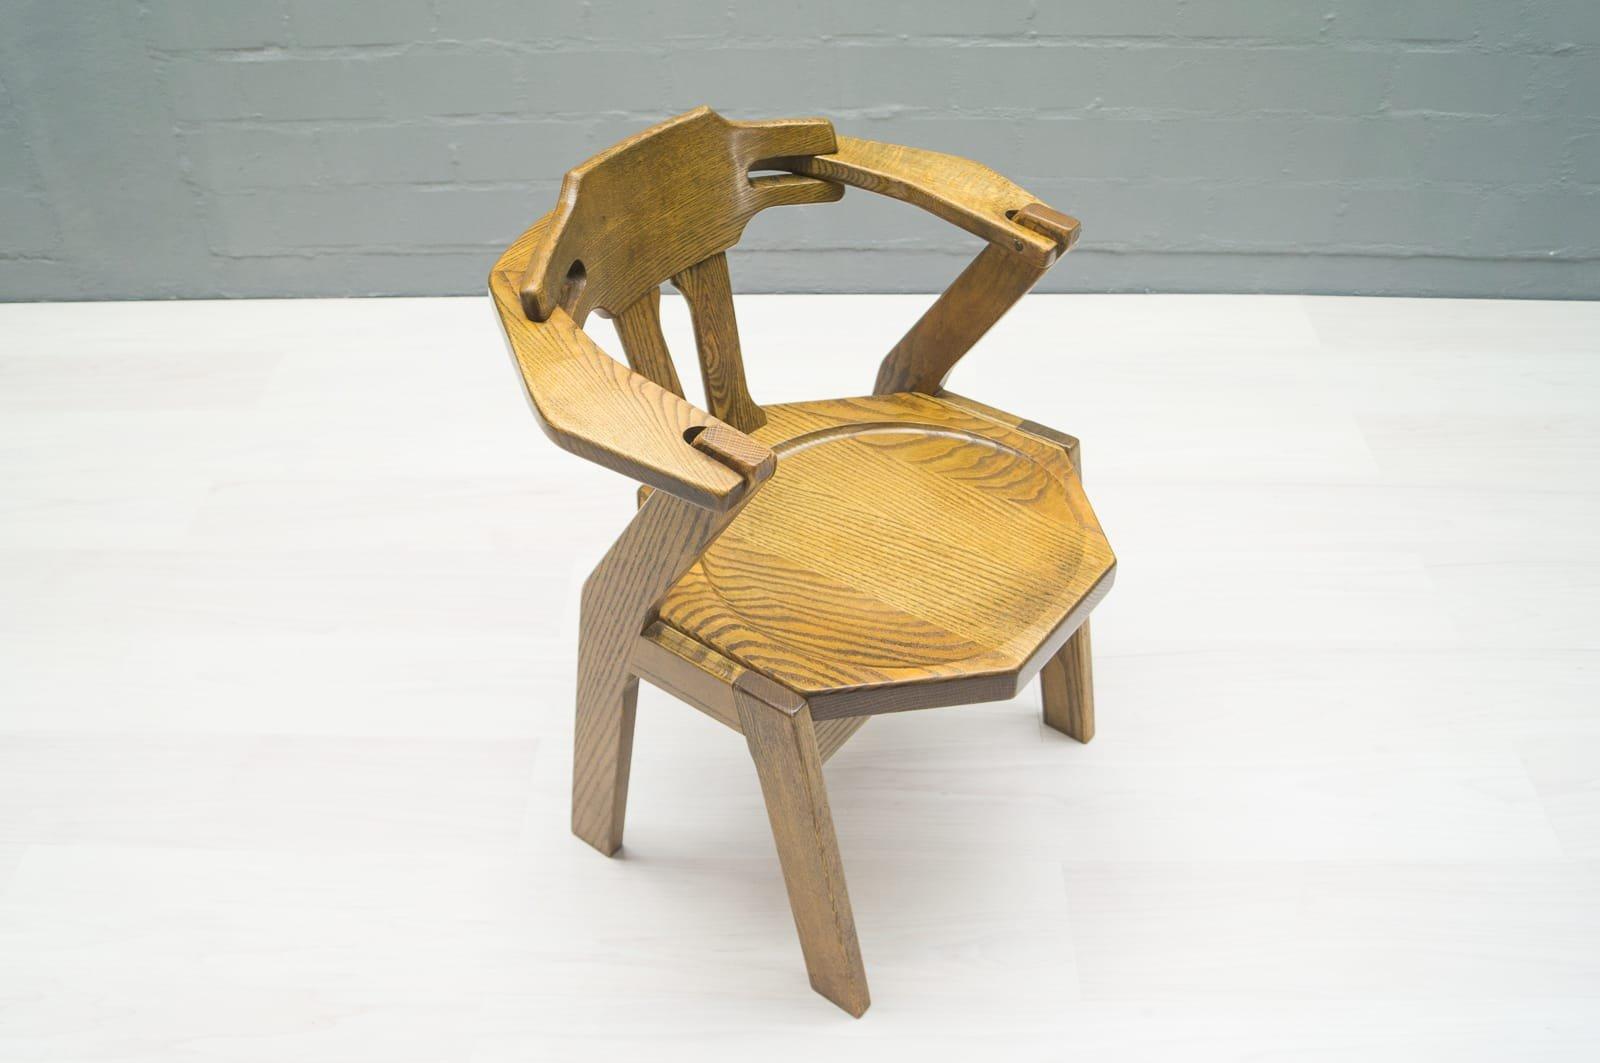 Mid Century Oak Dining Chairs Set of 4 for sale at Pamono : mid century oak dining chairs set of 4 6 from www.pamono.com size 1600 x 1063 jpeg 85kB